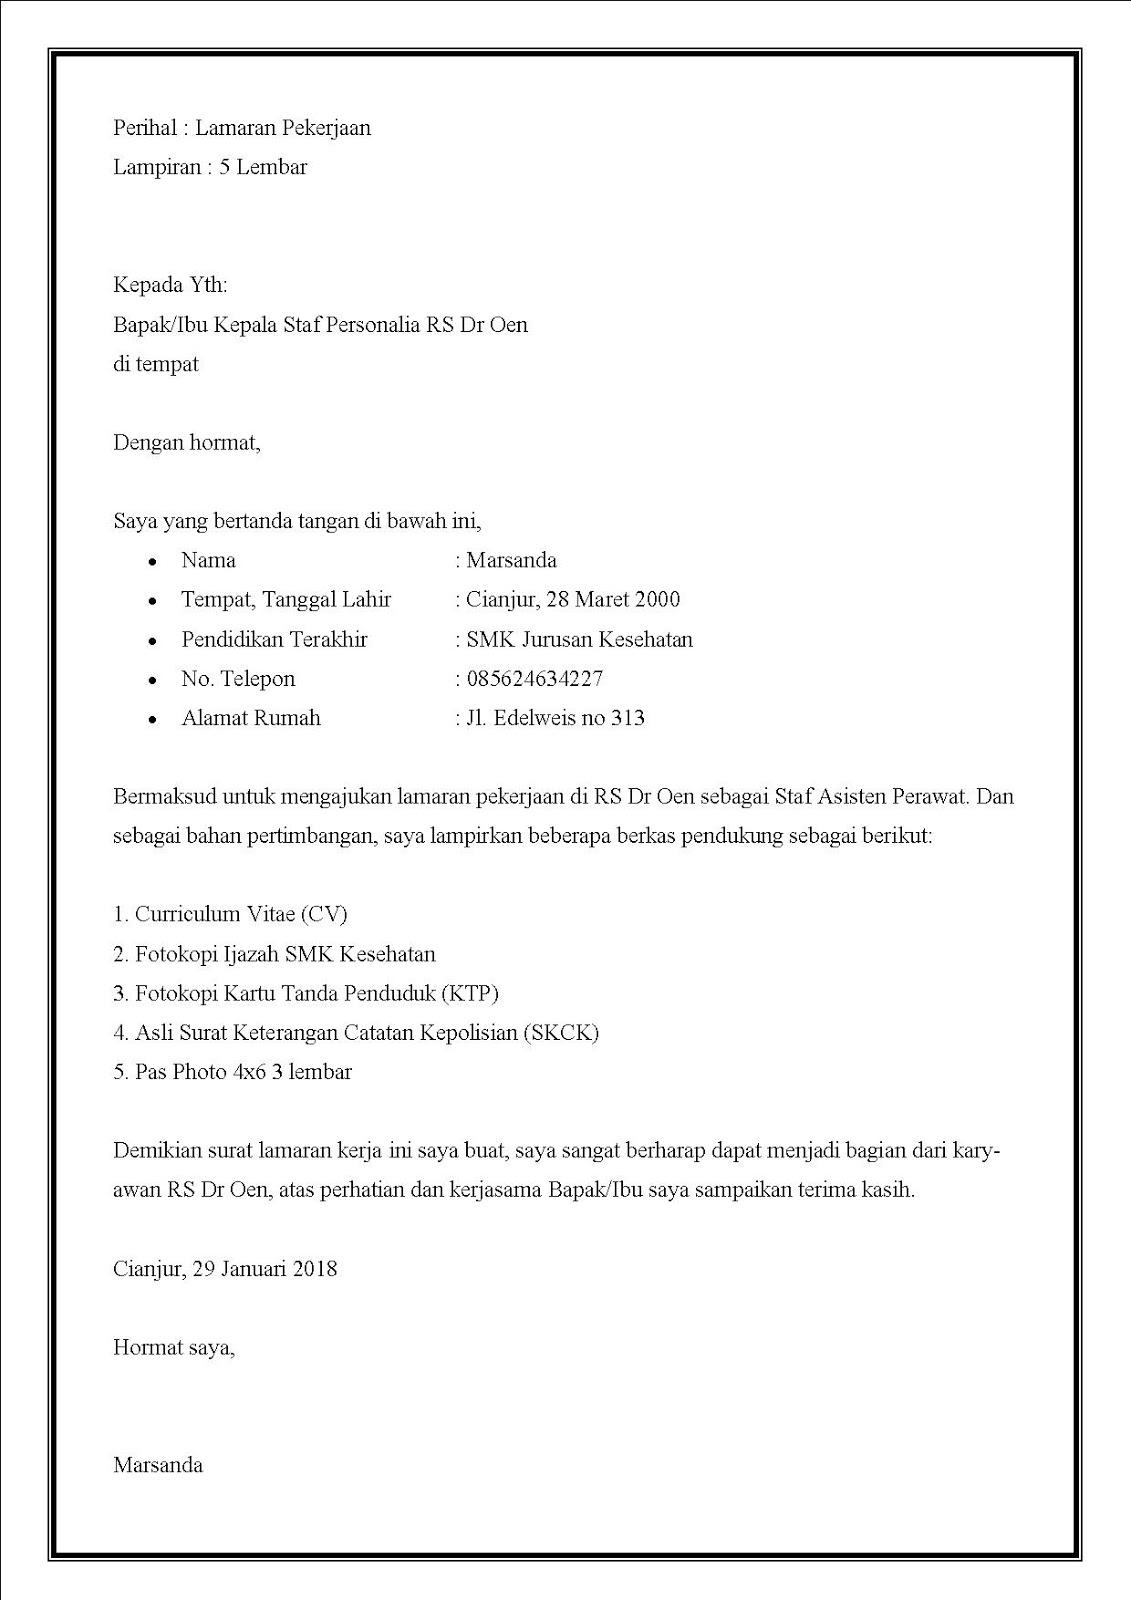 Contoh Surat lamaran di rumah sakit lulusan SMK